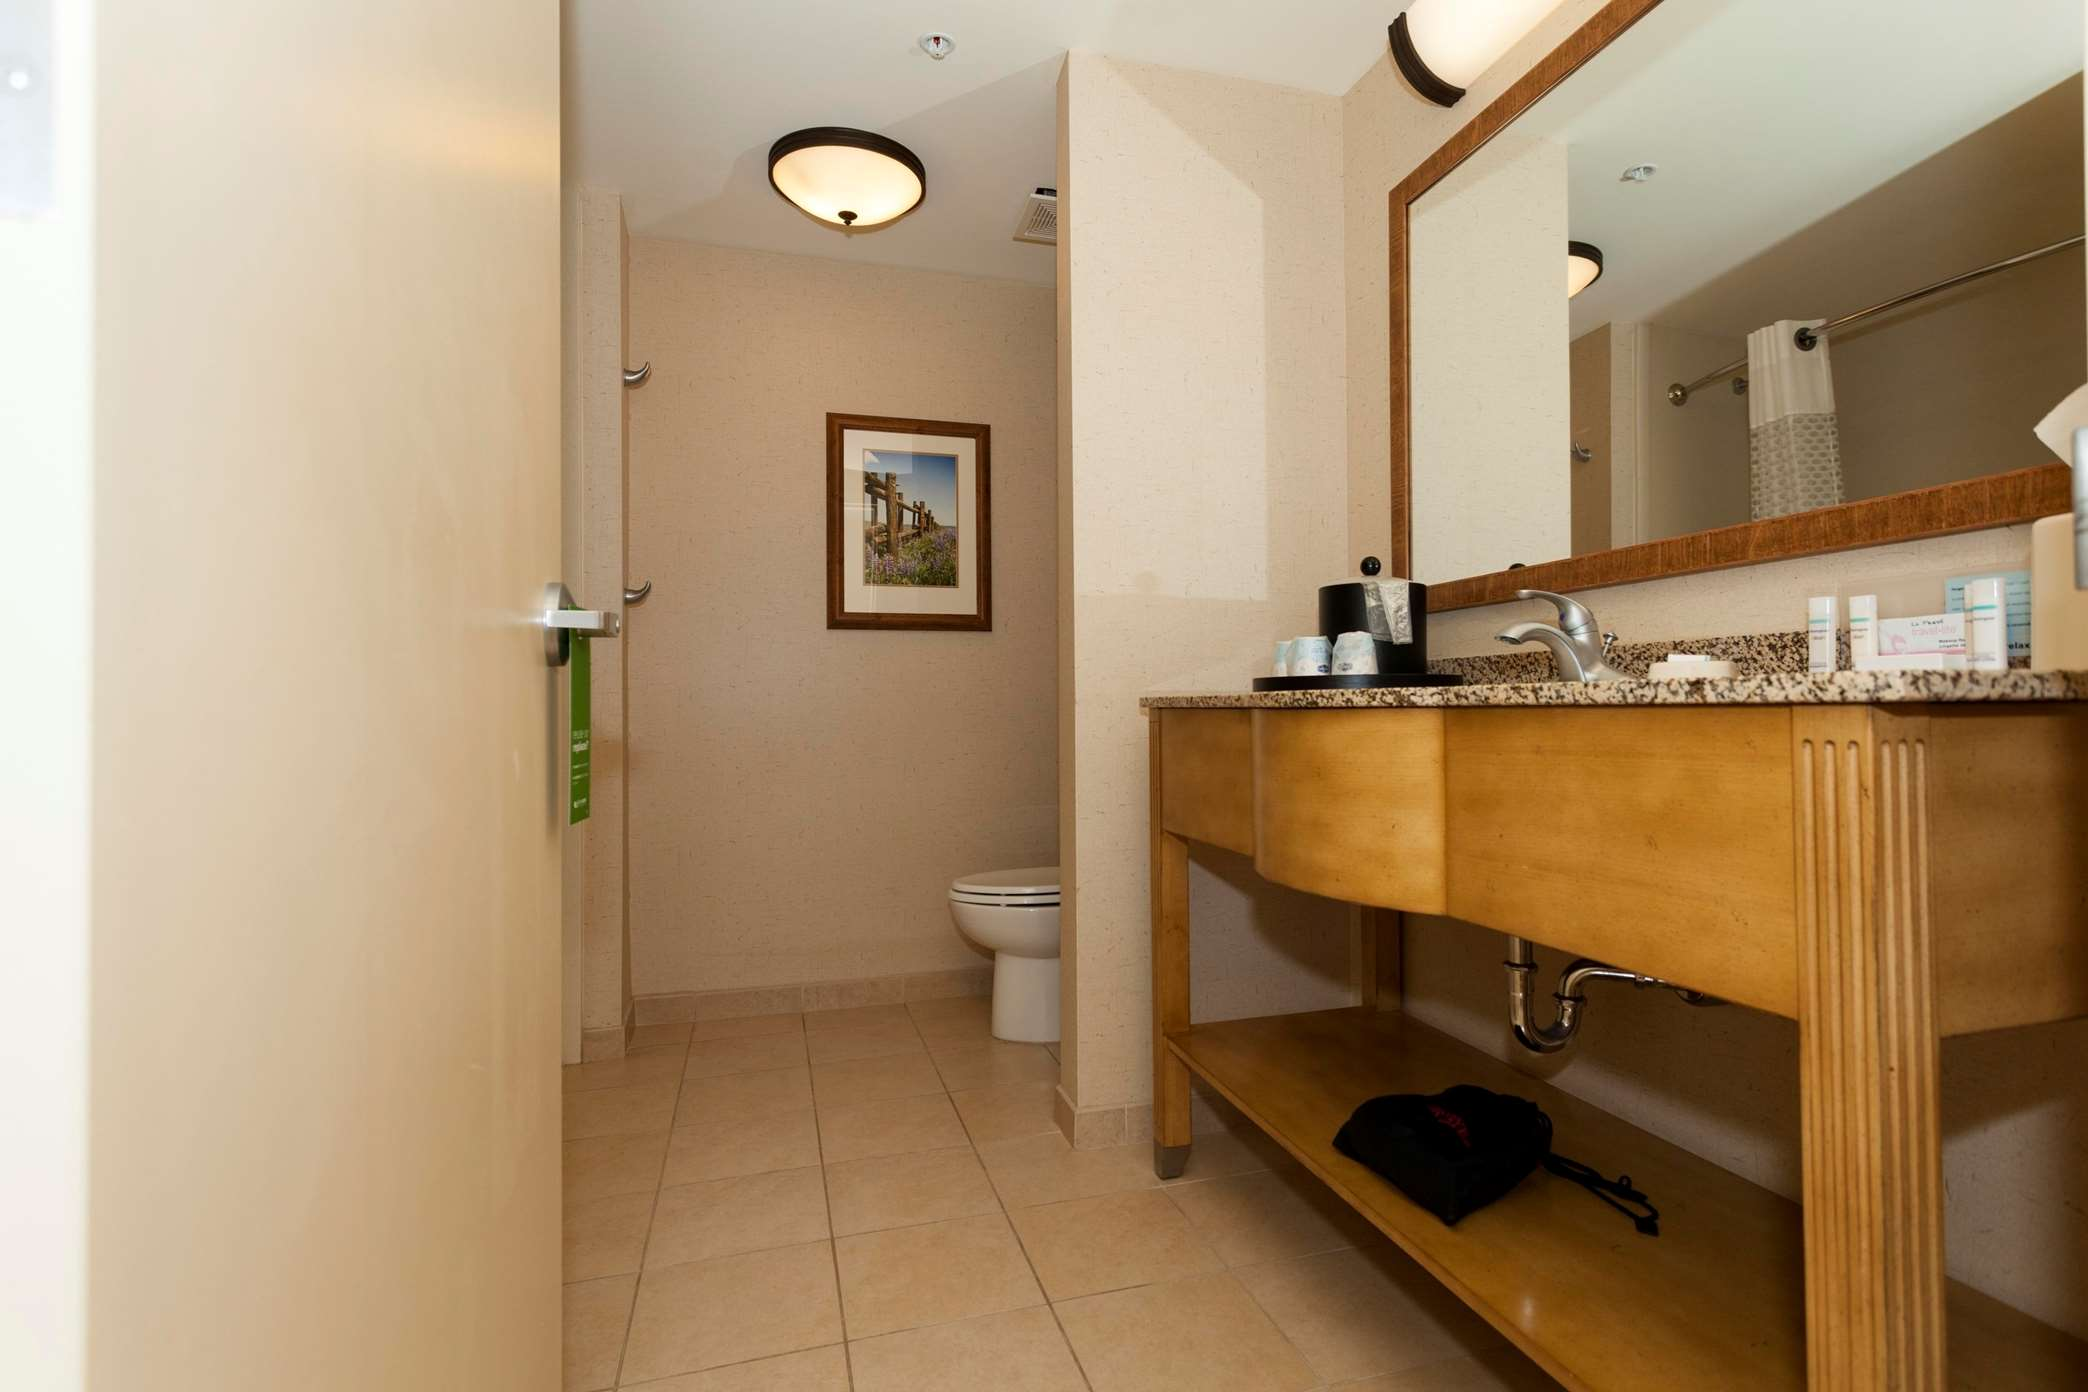 Hampton Inn & Suites Riverton image 13